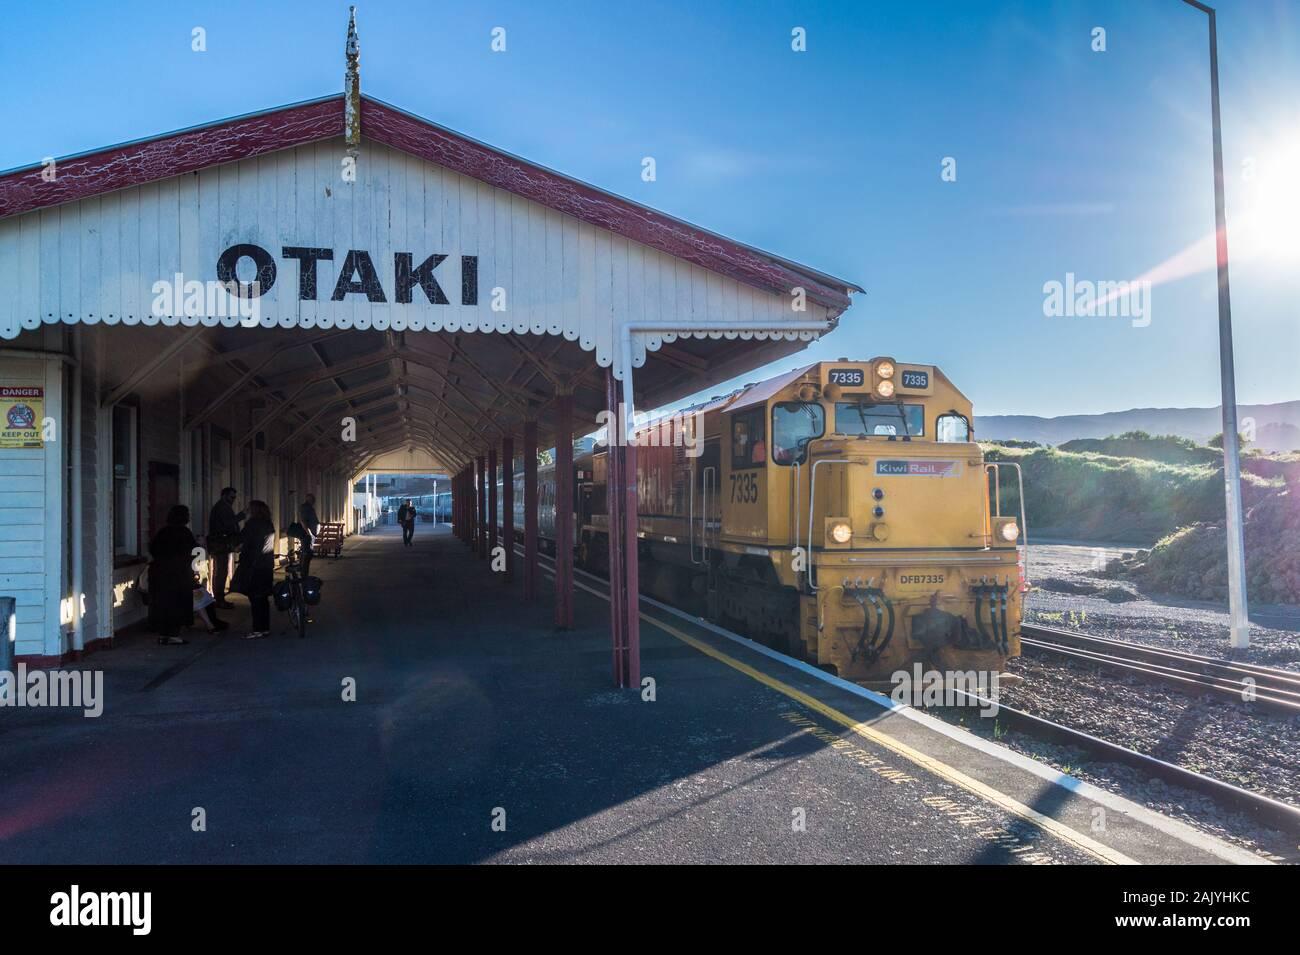 DF class locomotive no. 7213, Capital Connection long-distance commuter train at Ōtaki station, North Island, New Zealand Stock Photo